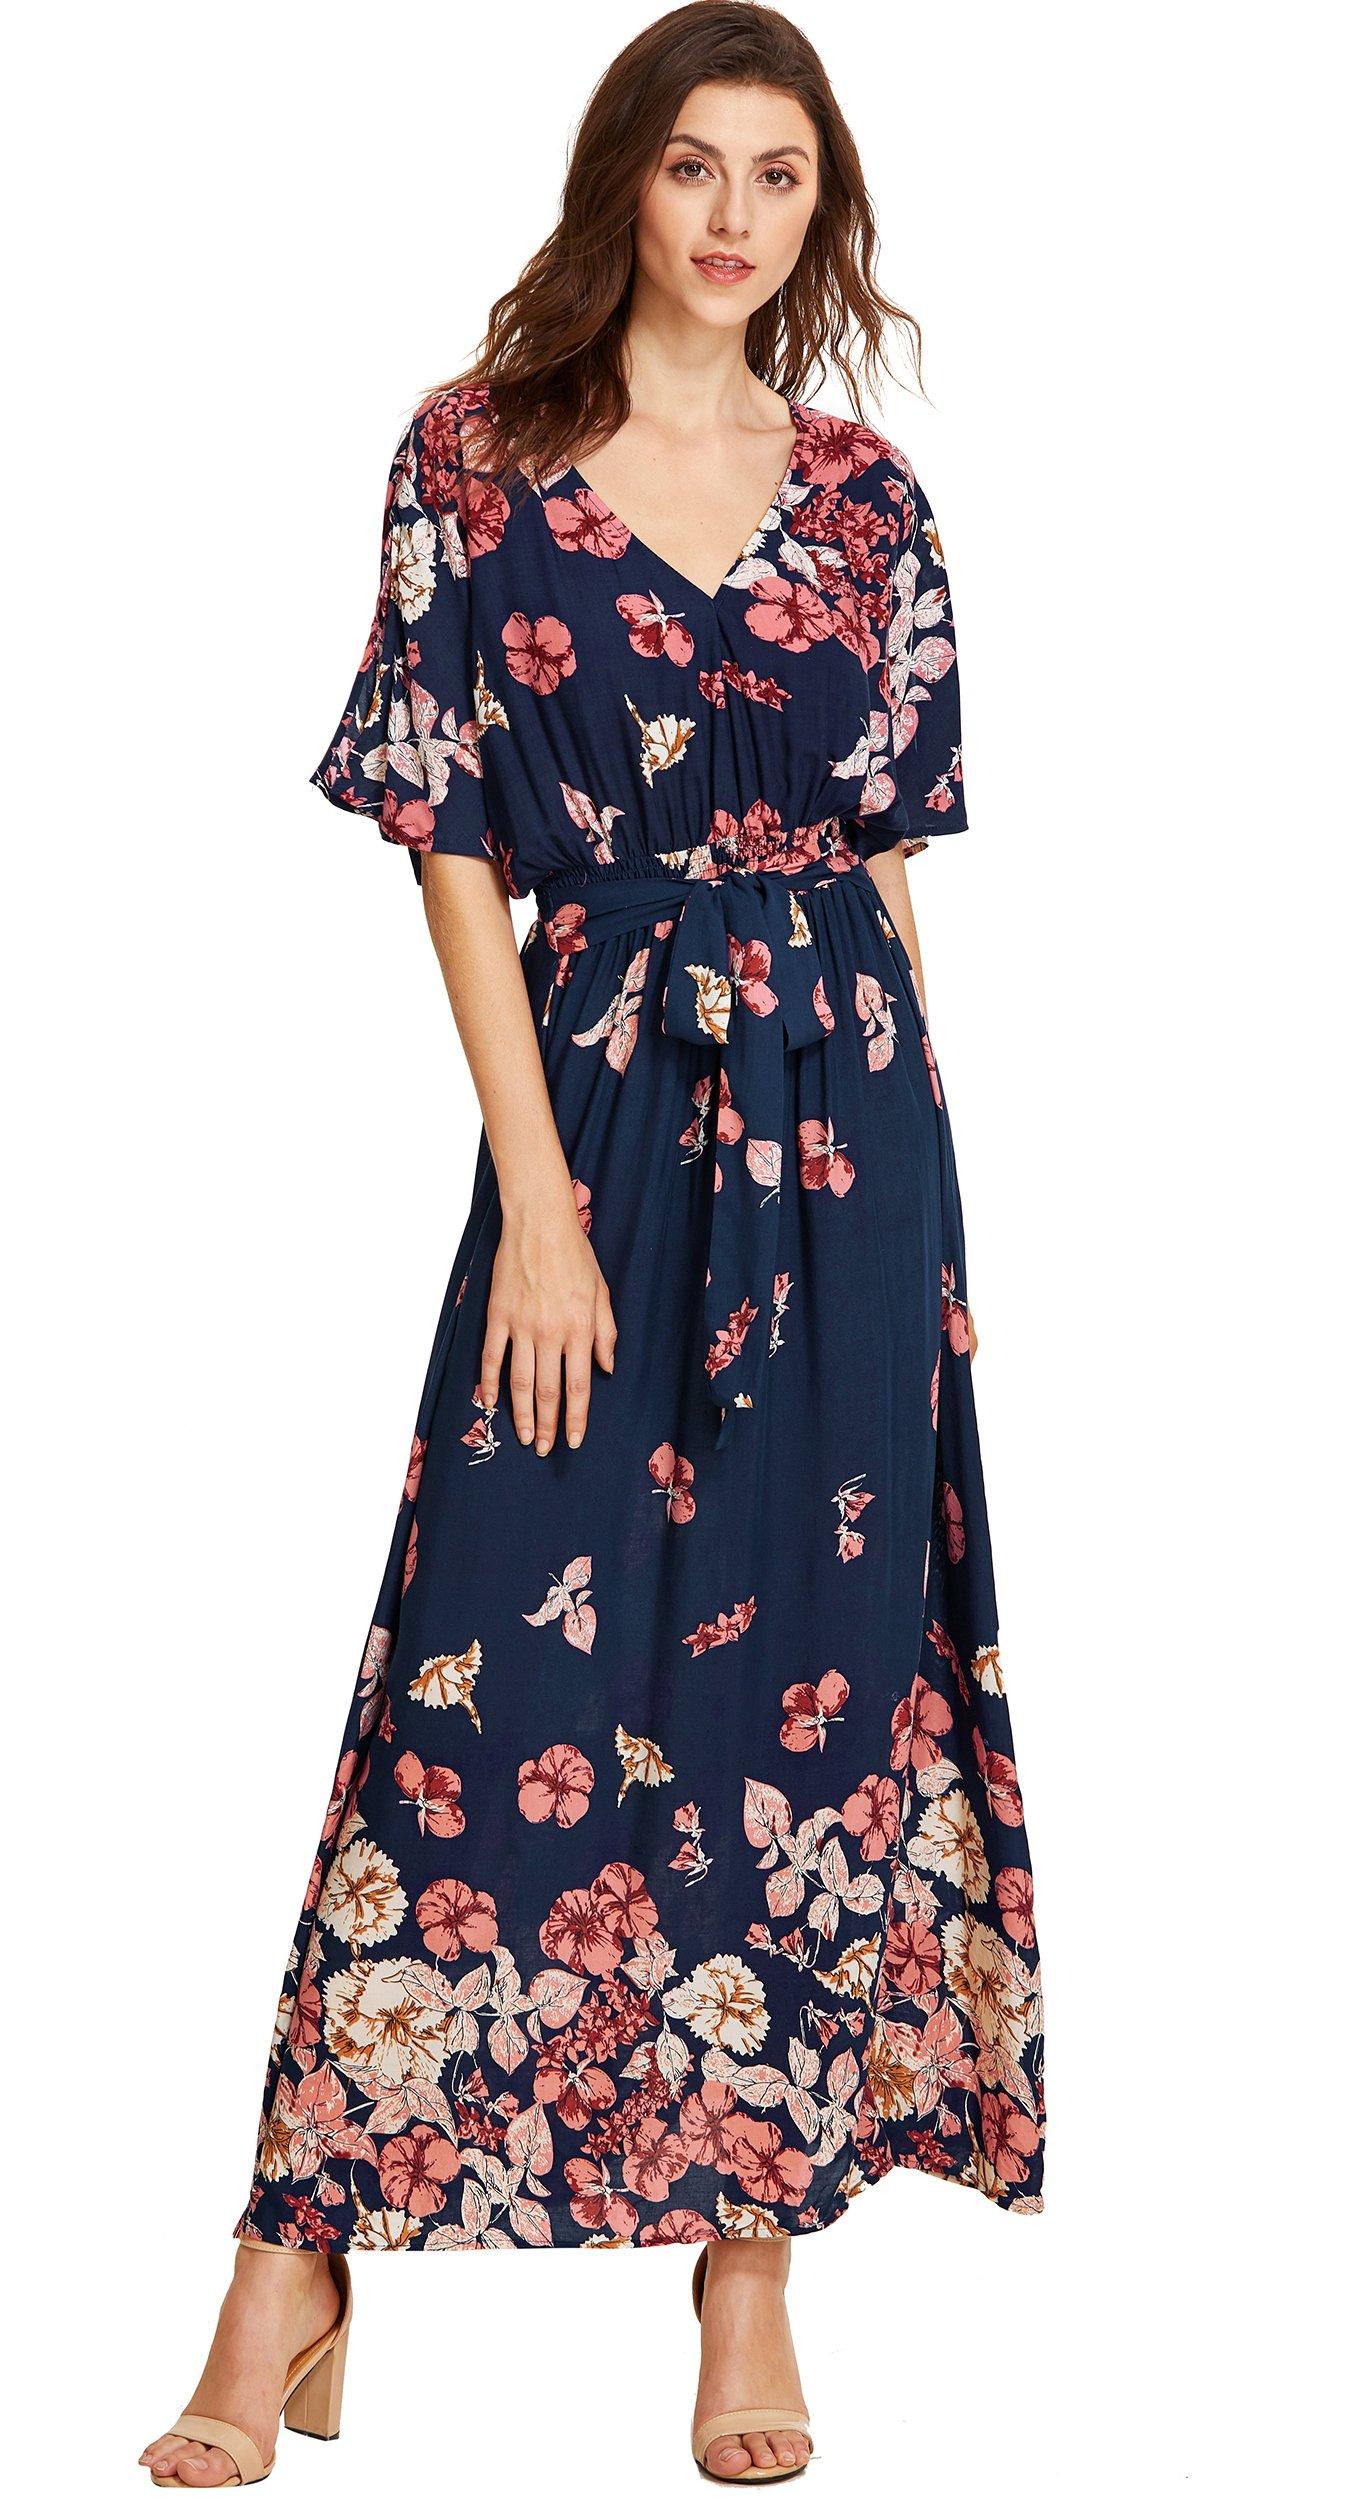 f557e9f83a38 Galleon - Milumia Women s Boho Split Tie-Waist Vintage Print Maxi Dress  Large Multicolor